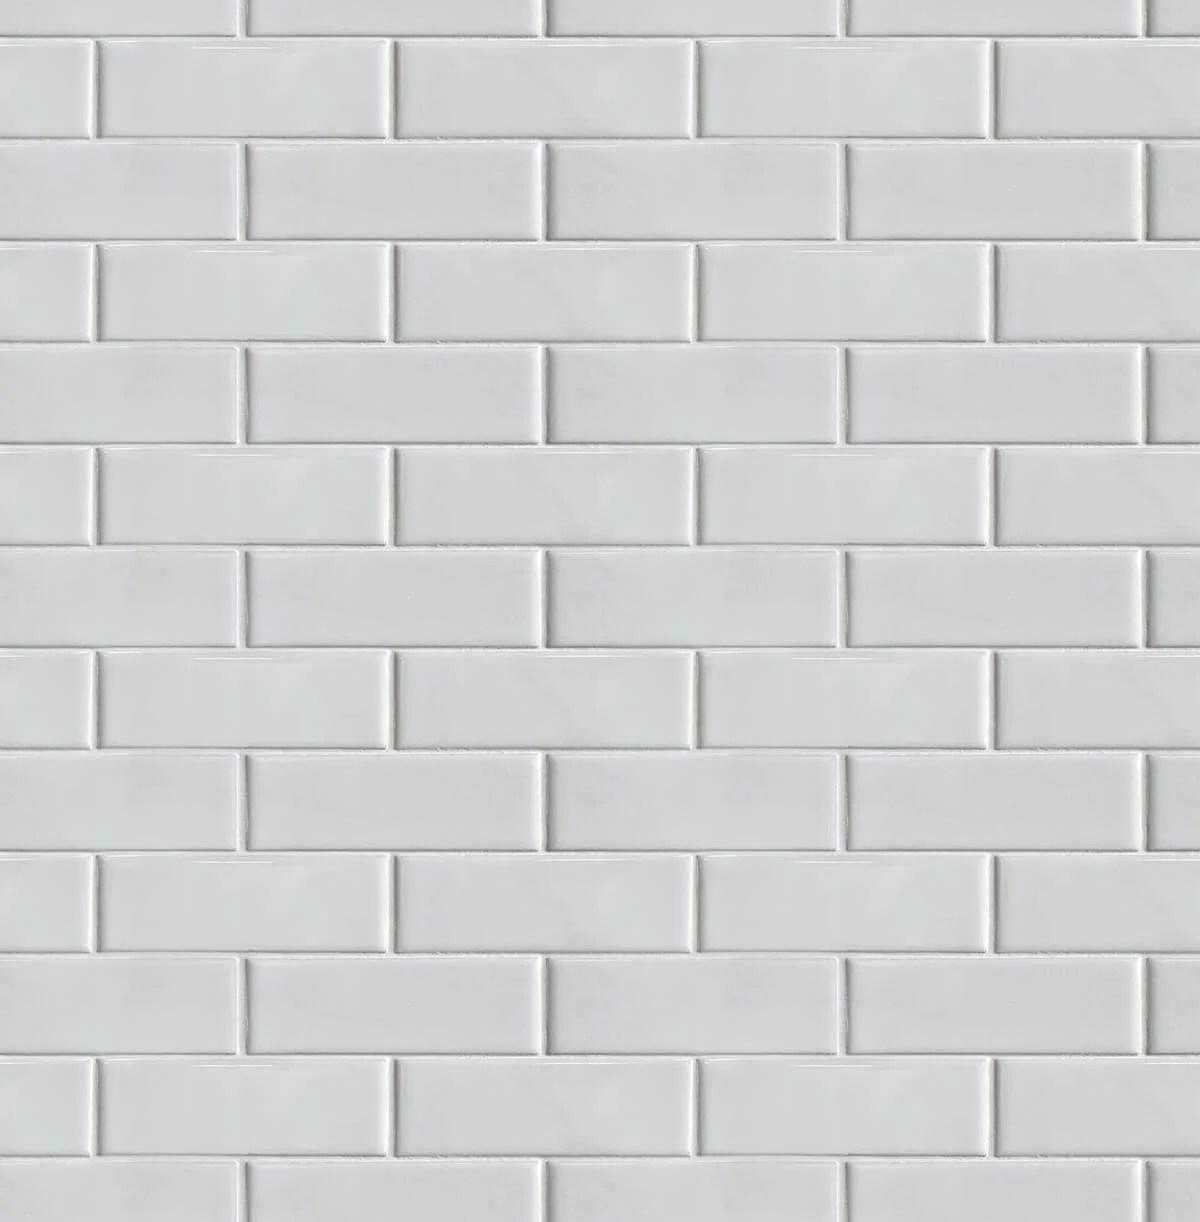 seabrook wallpaper